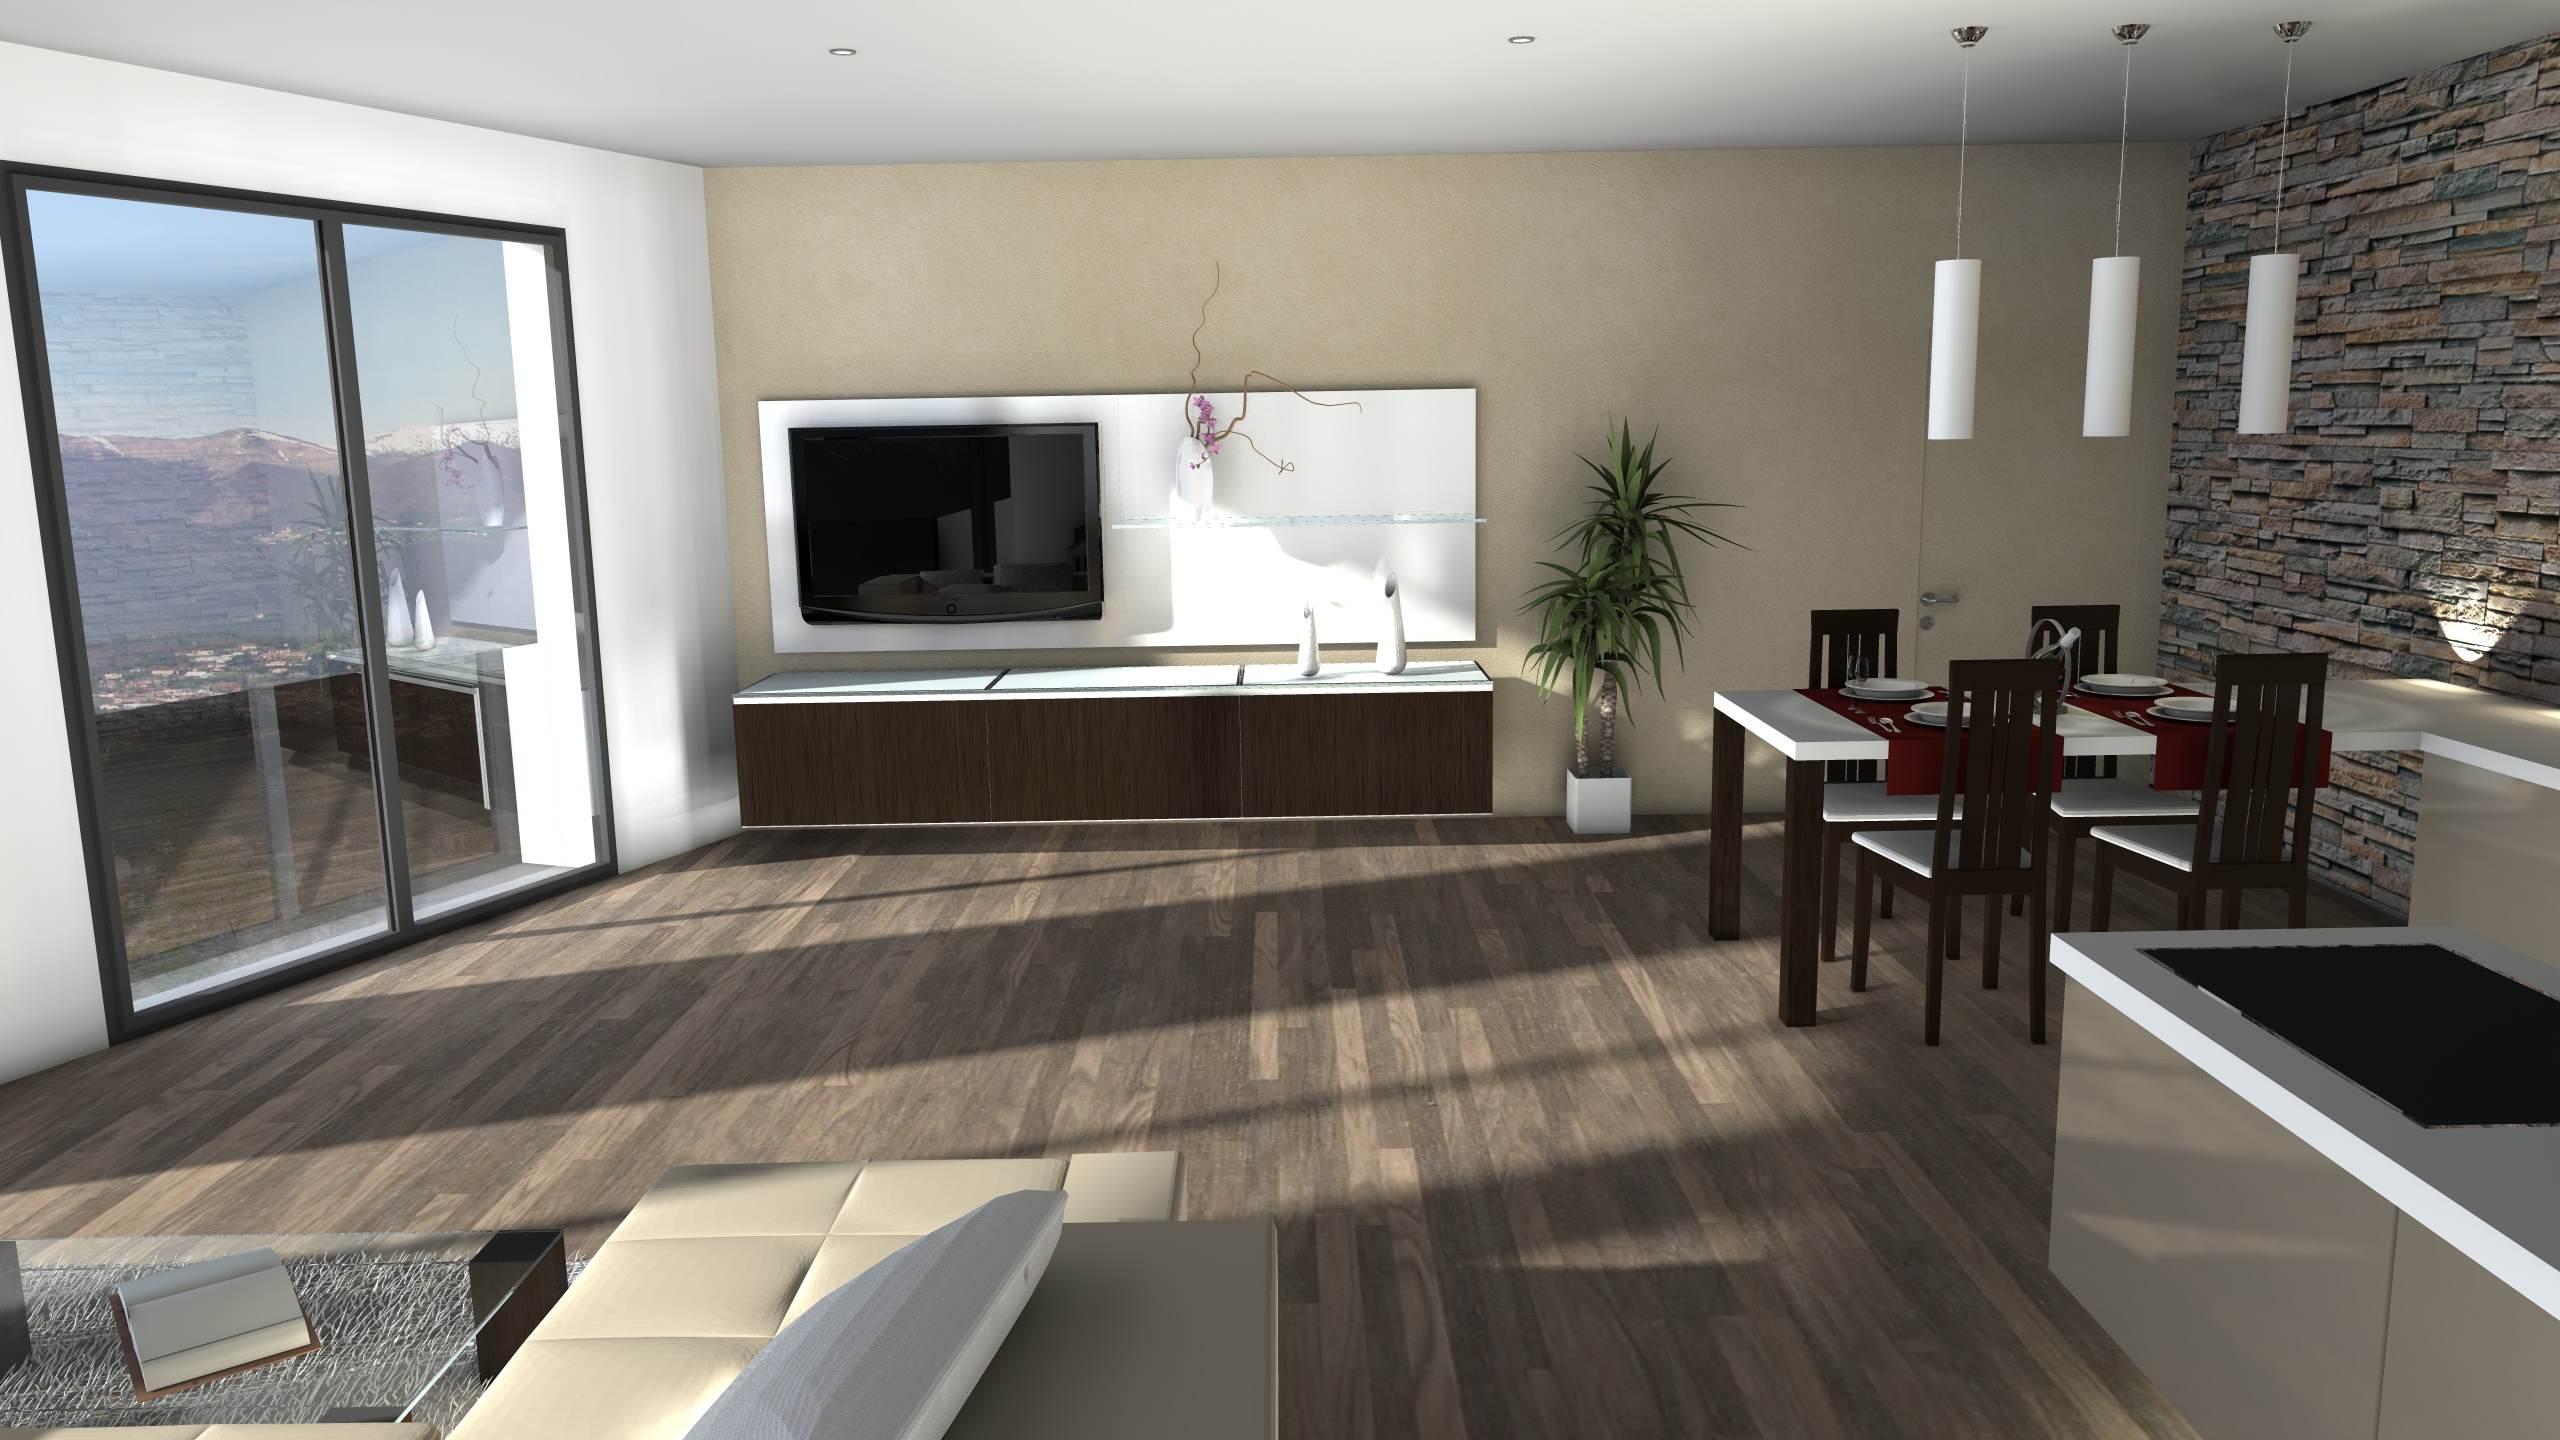 Arredamenti per interni moderni tende d arredo per - Arredamento interni design ...